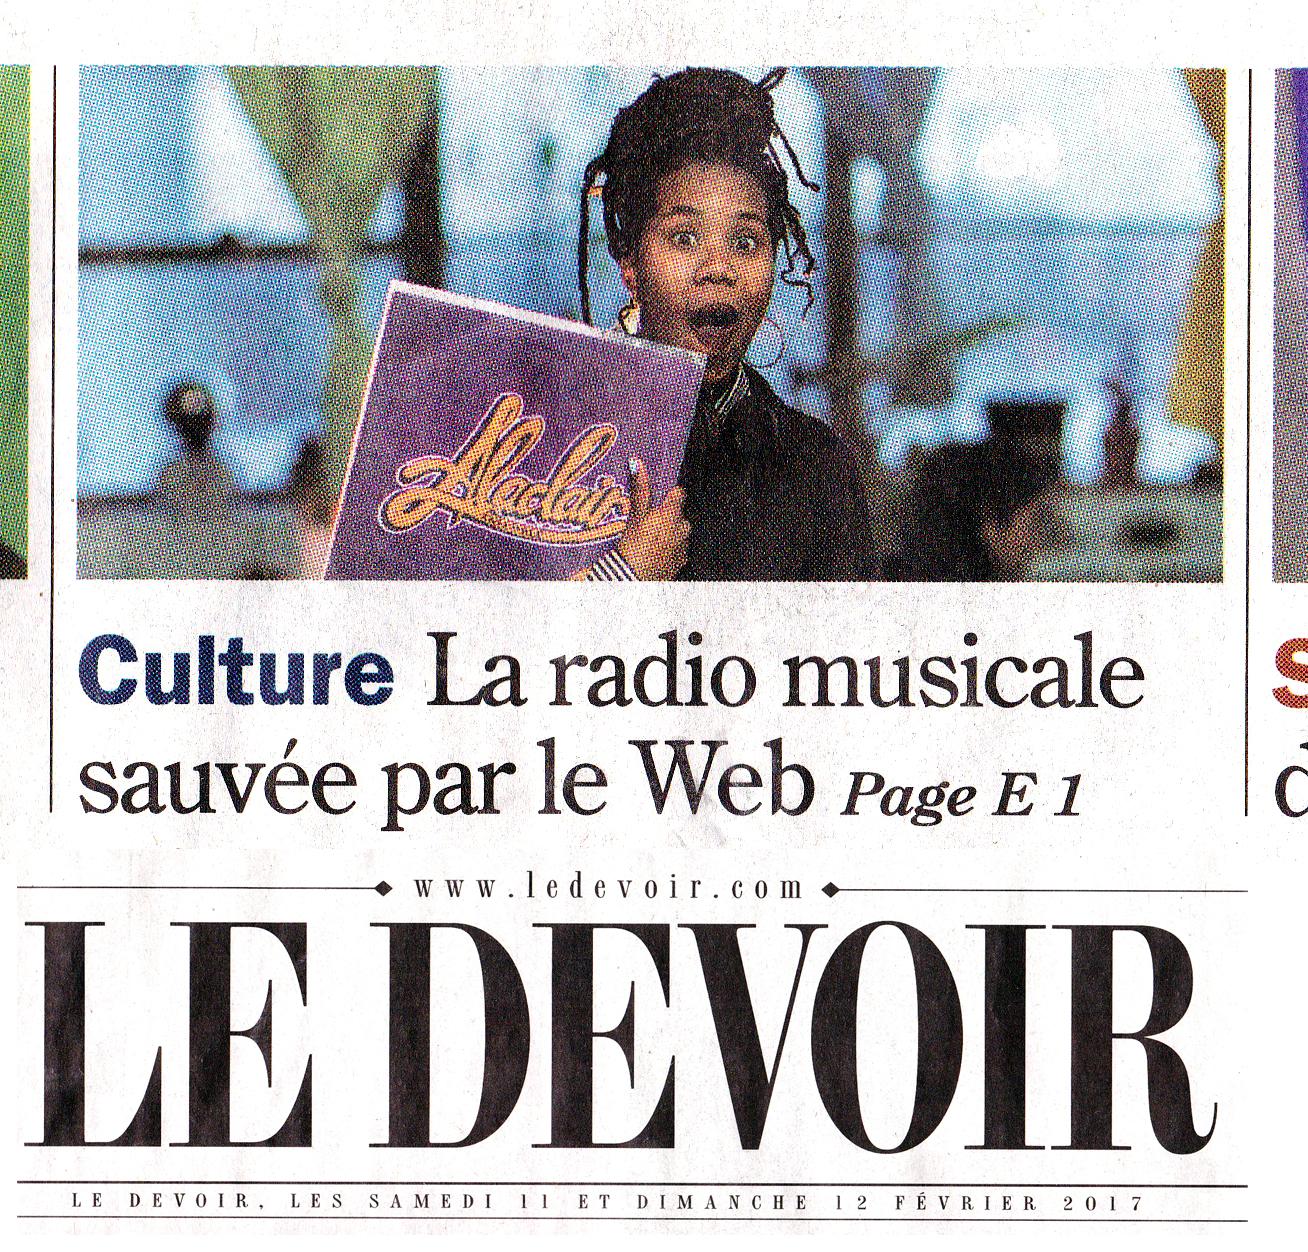 Alaclair 24,99 Devoir Web Radio